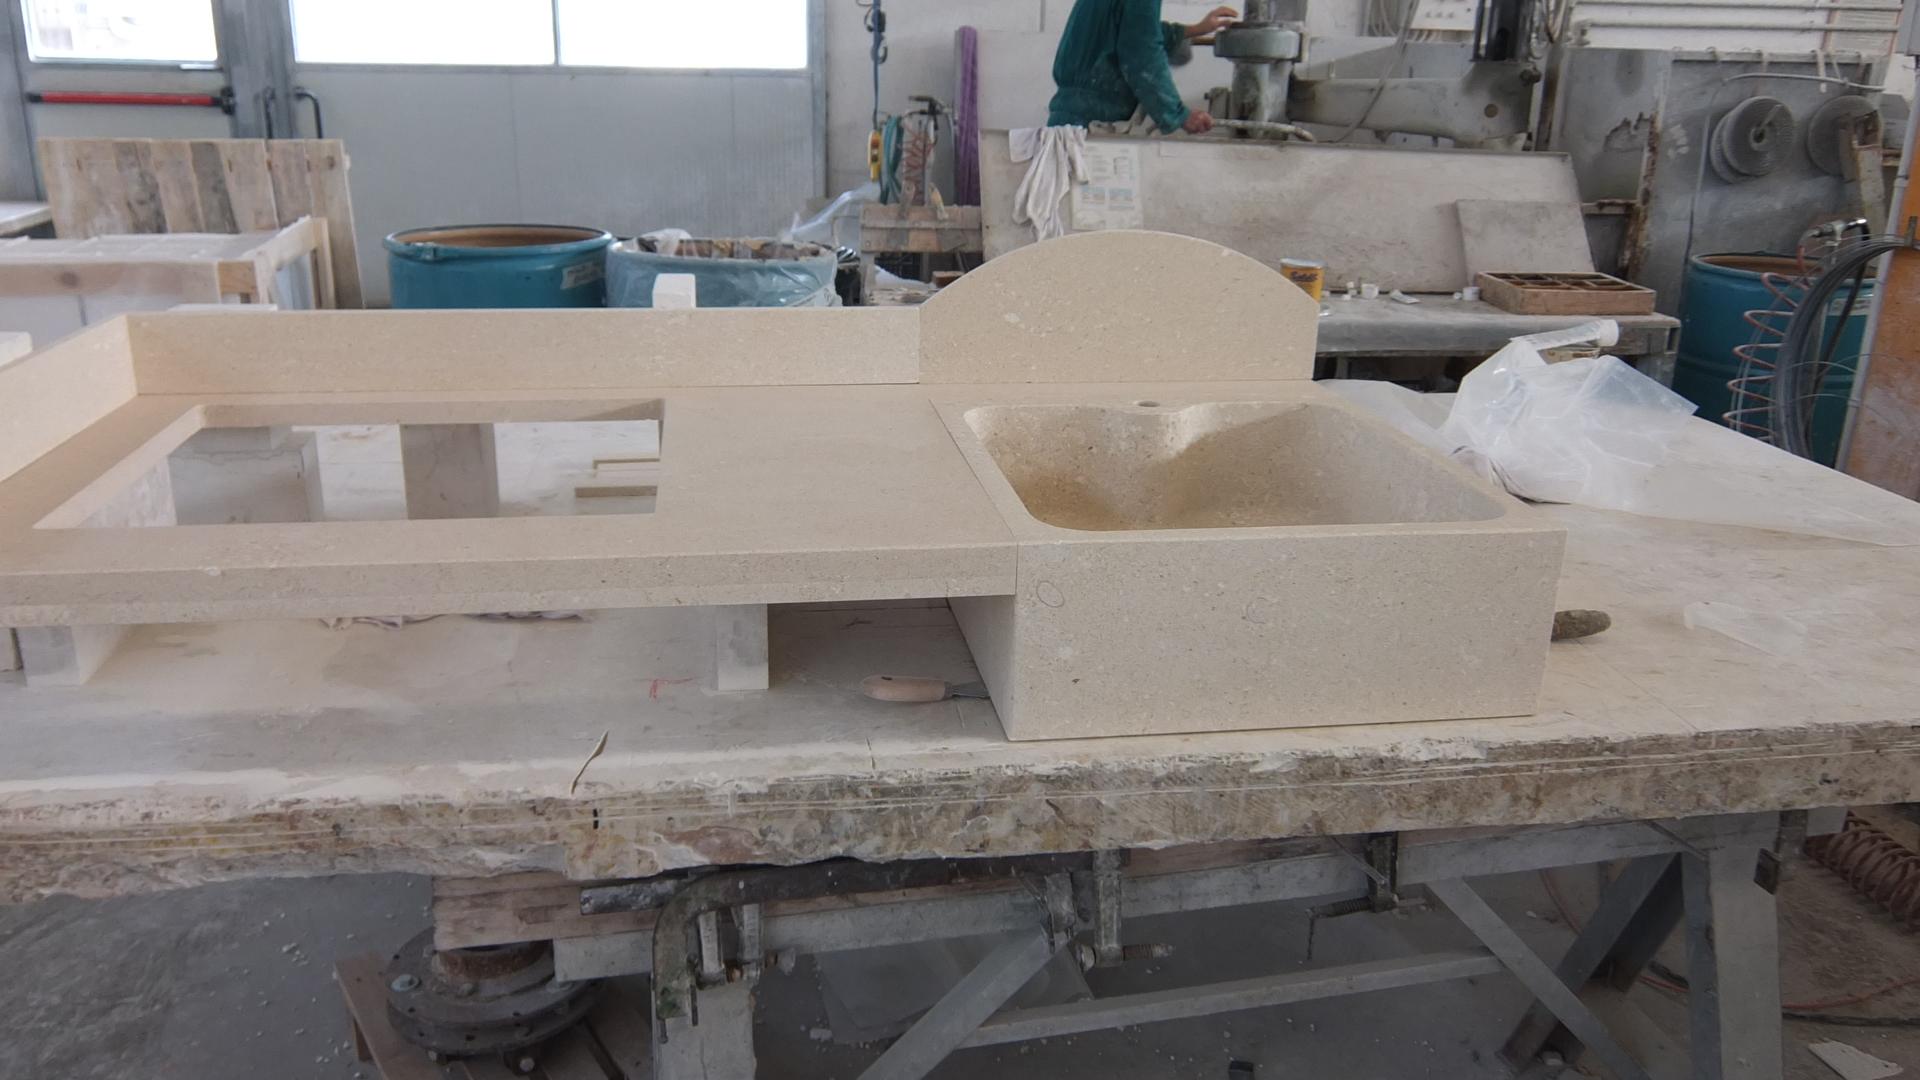 Foto top cucina con lavello - Cucine in pietra ...